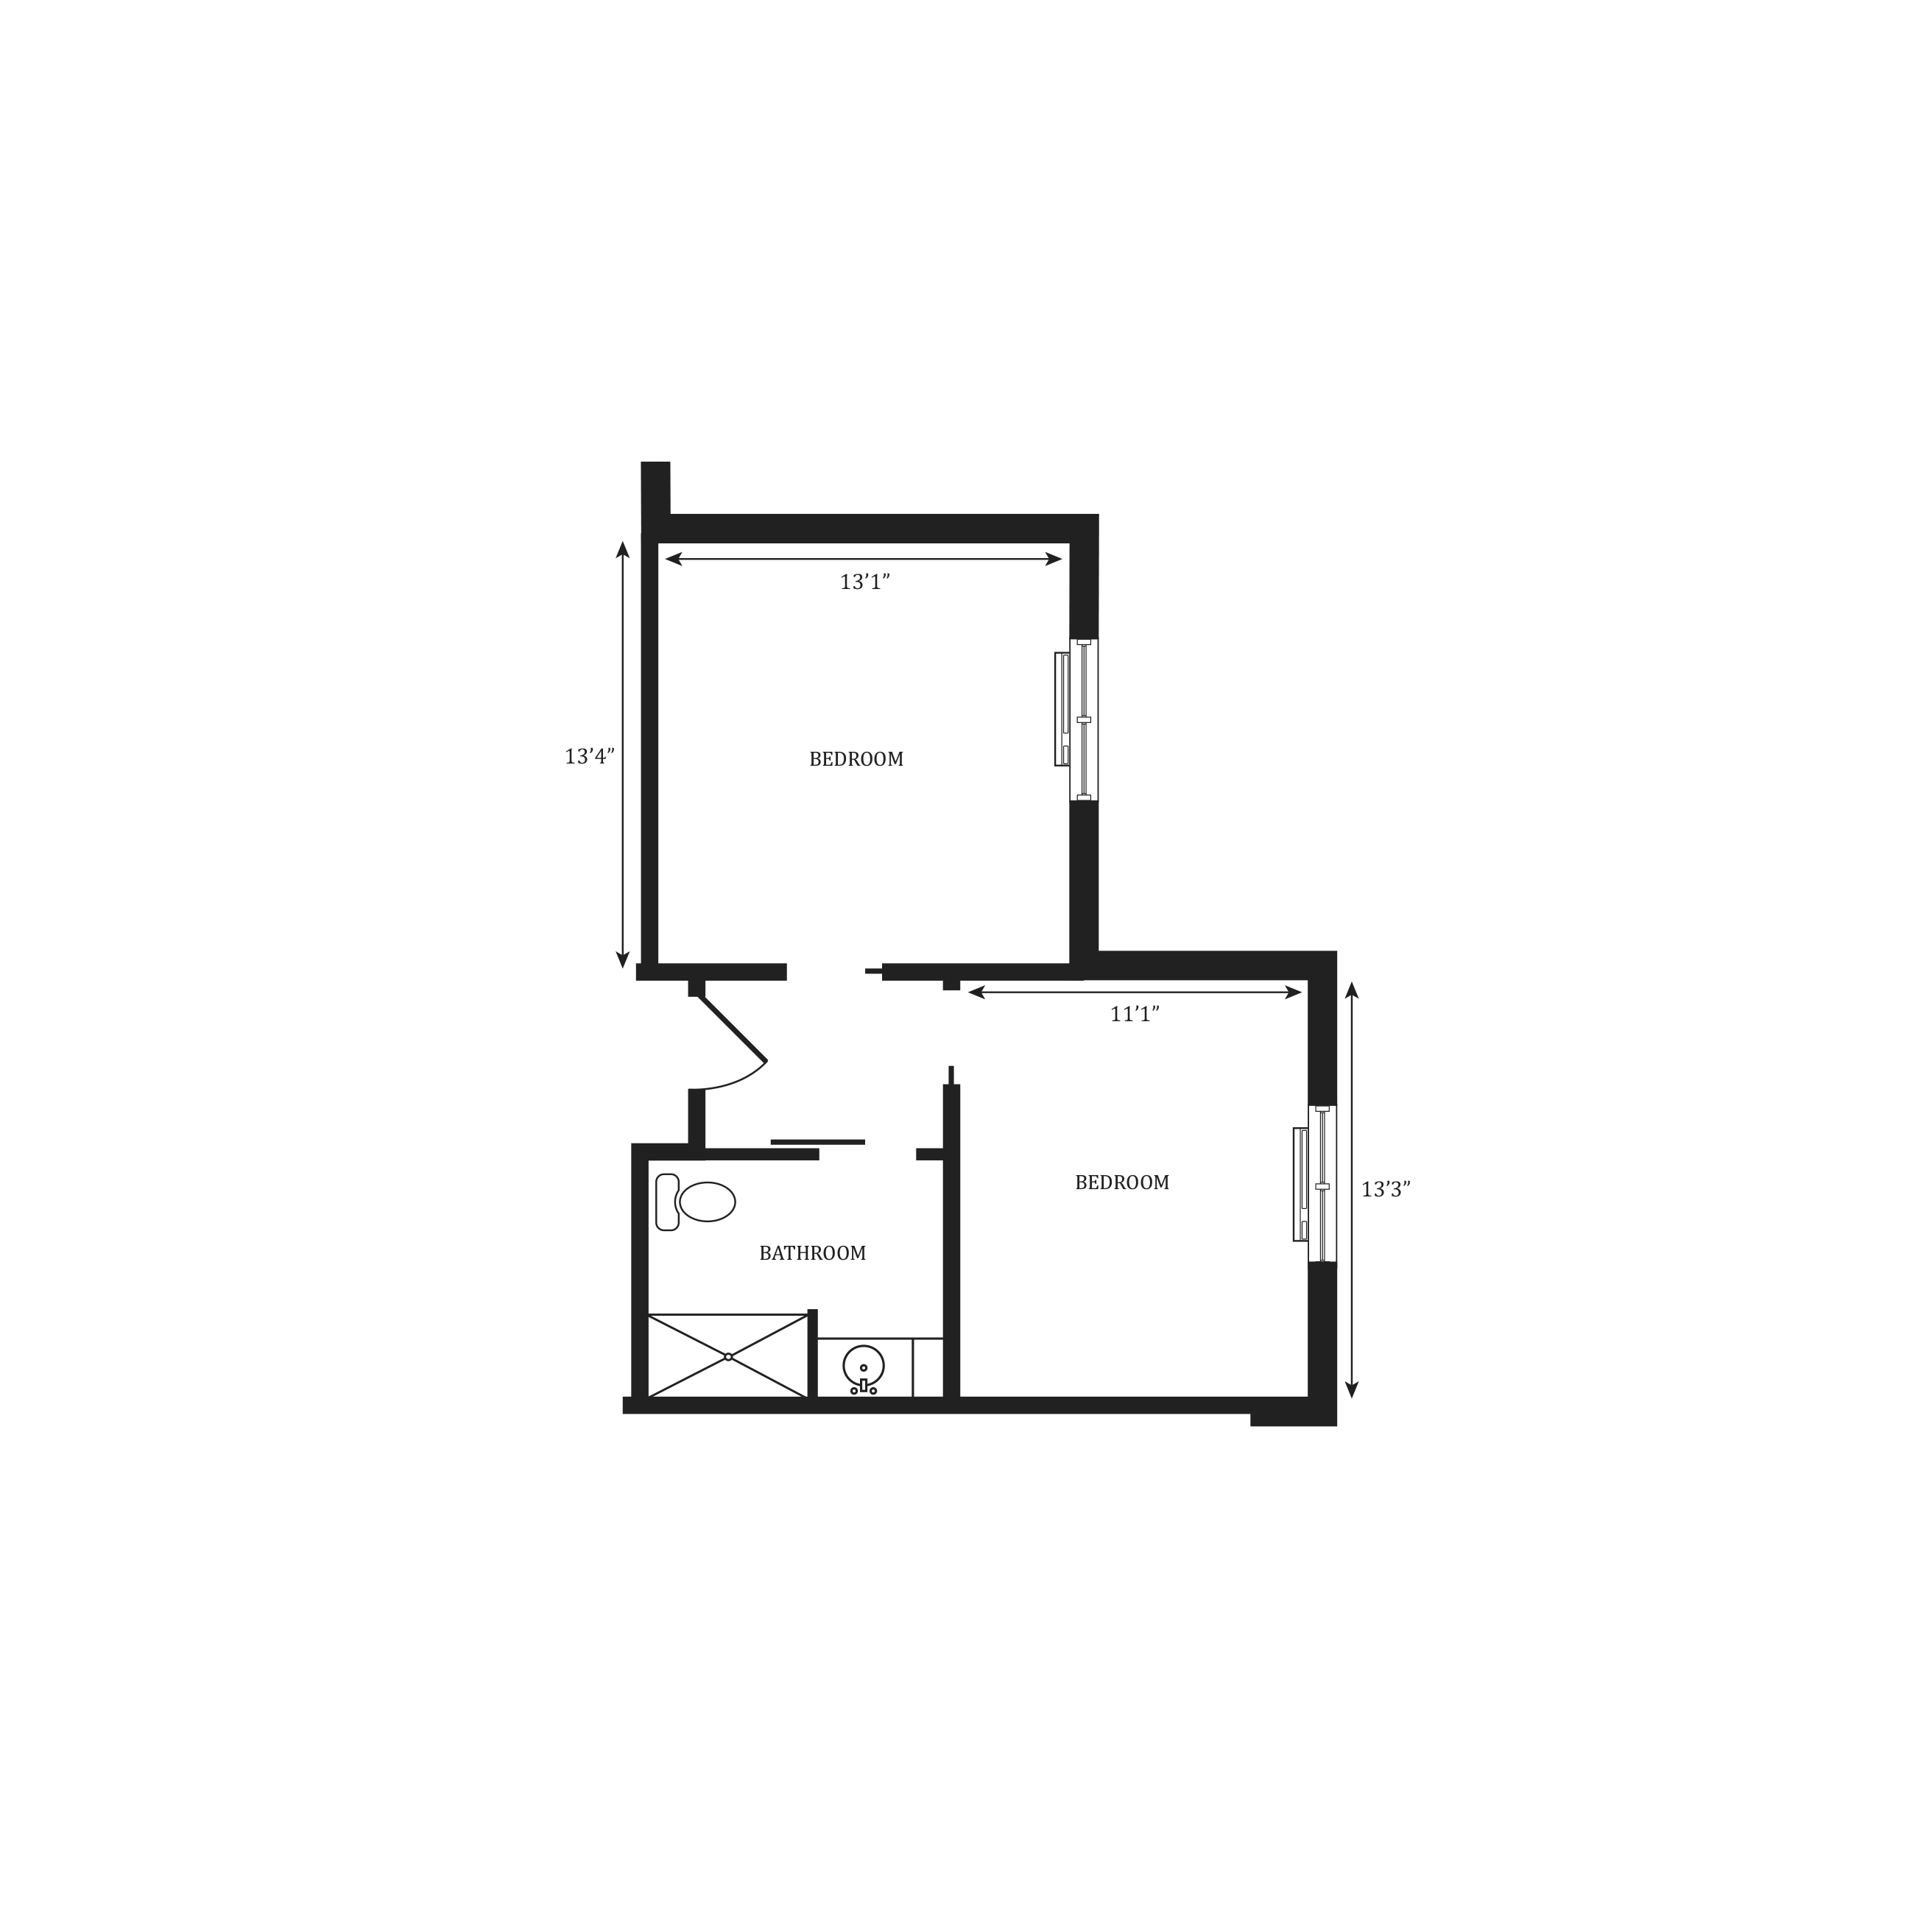 Duesenberg floor plan